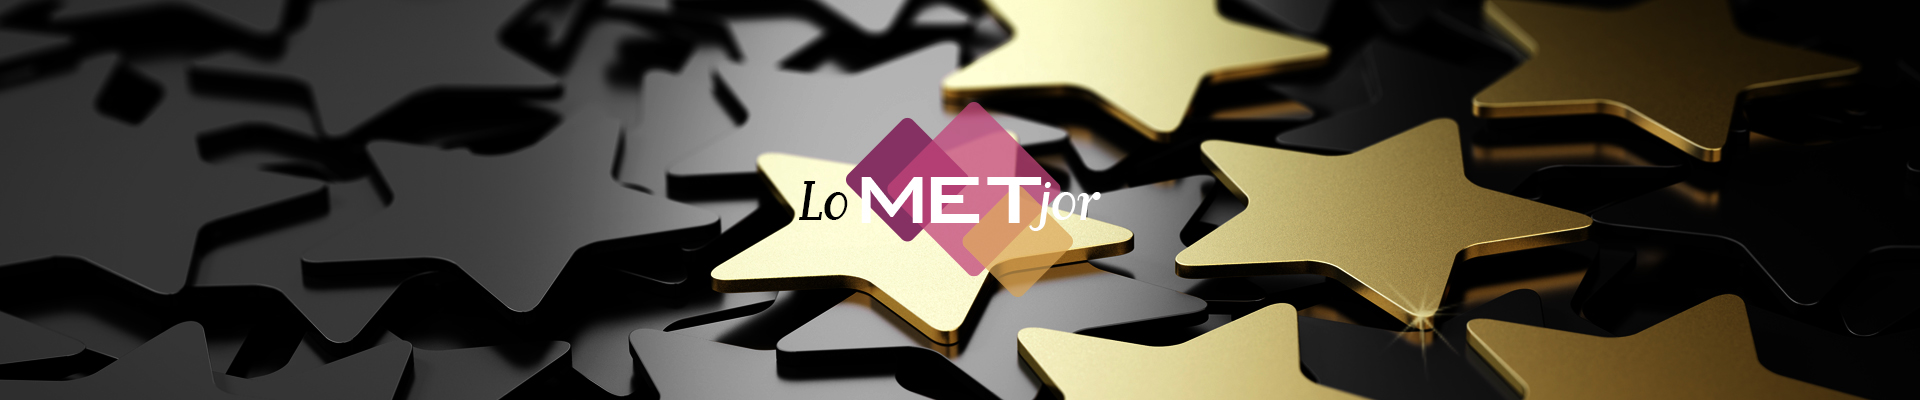 Header_METjor